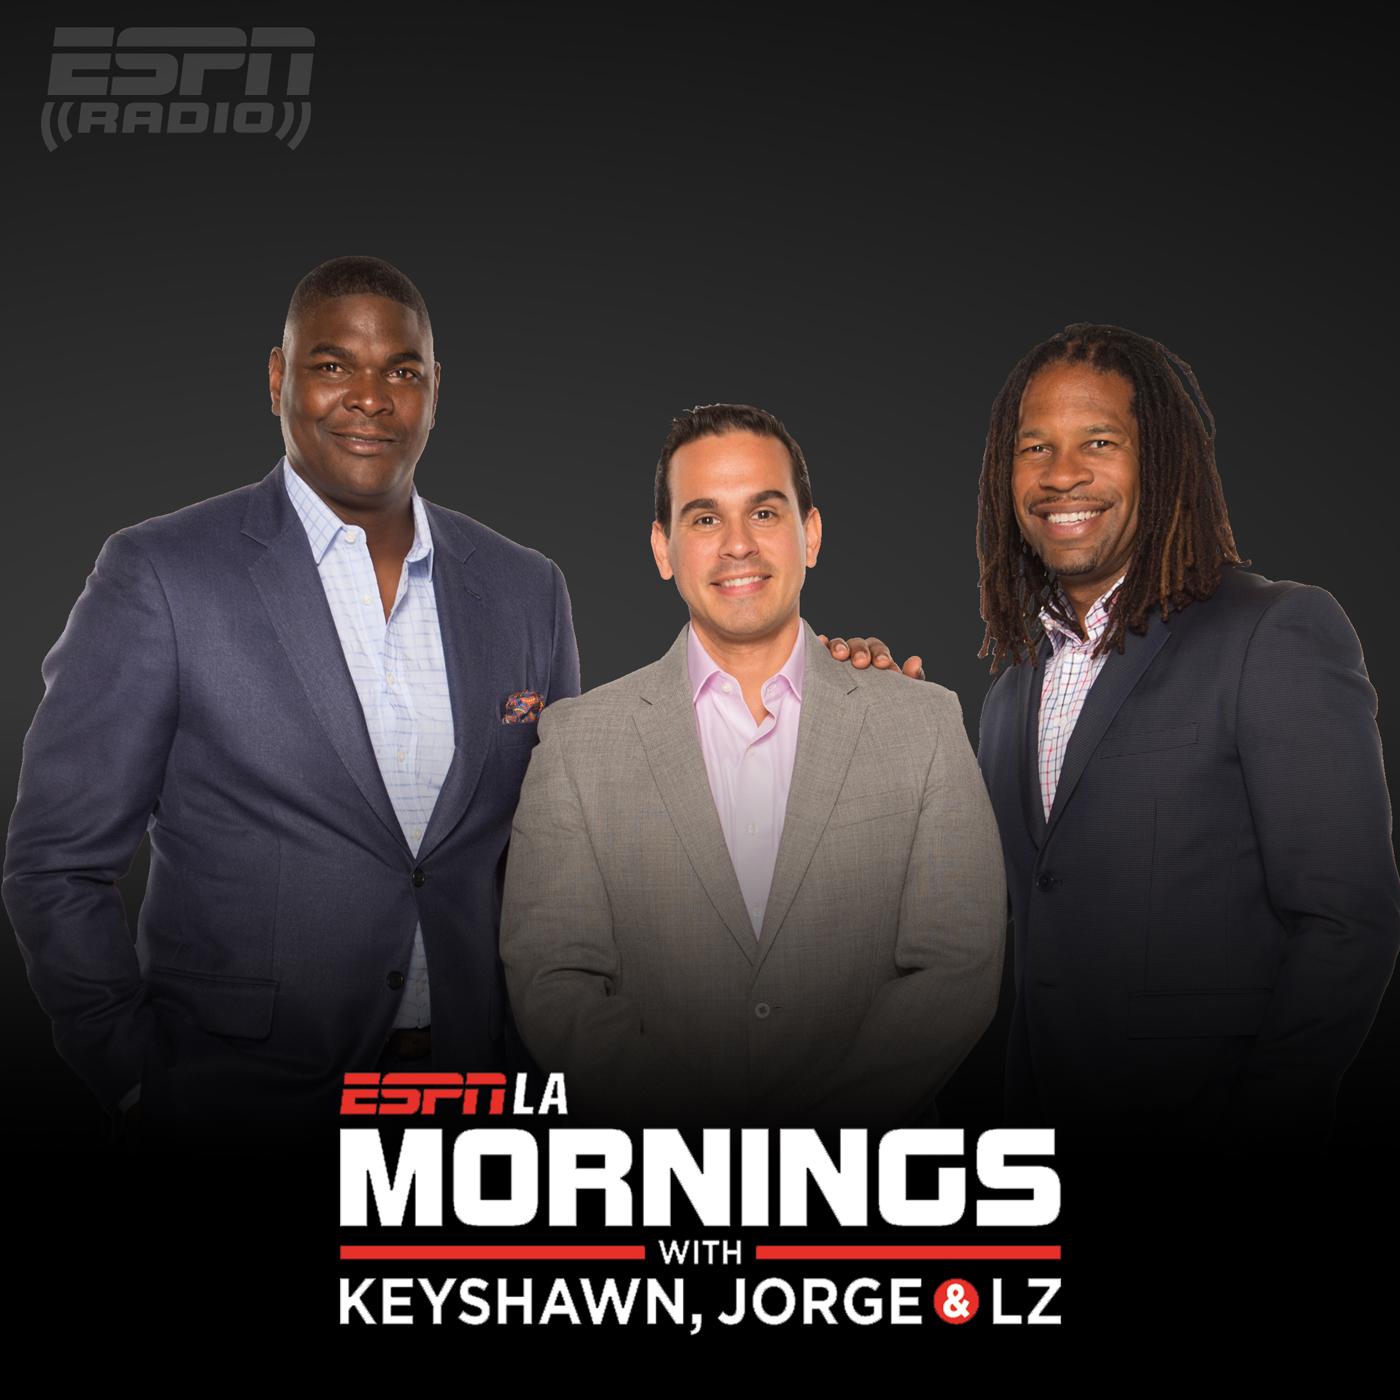 ESPNLA Mornings with Keyshawn, Jorge & LZ